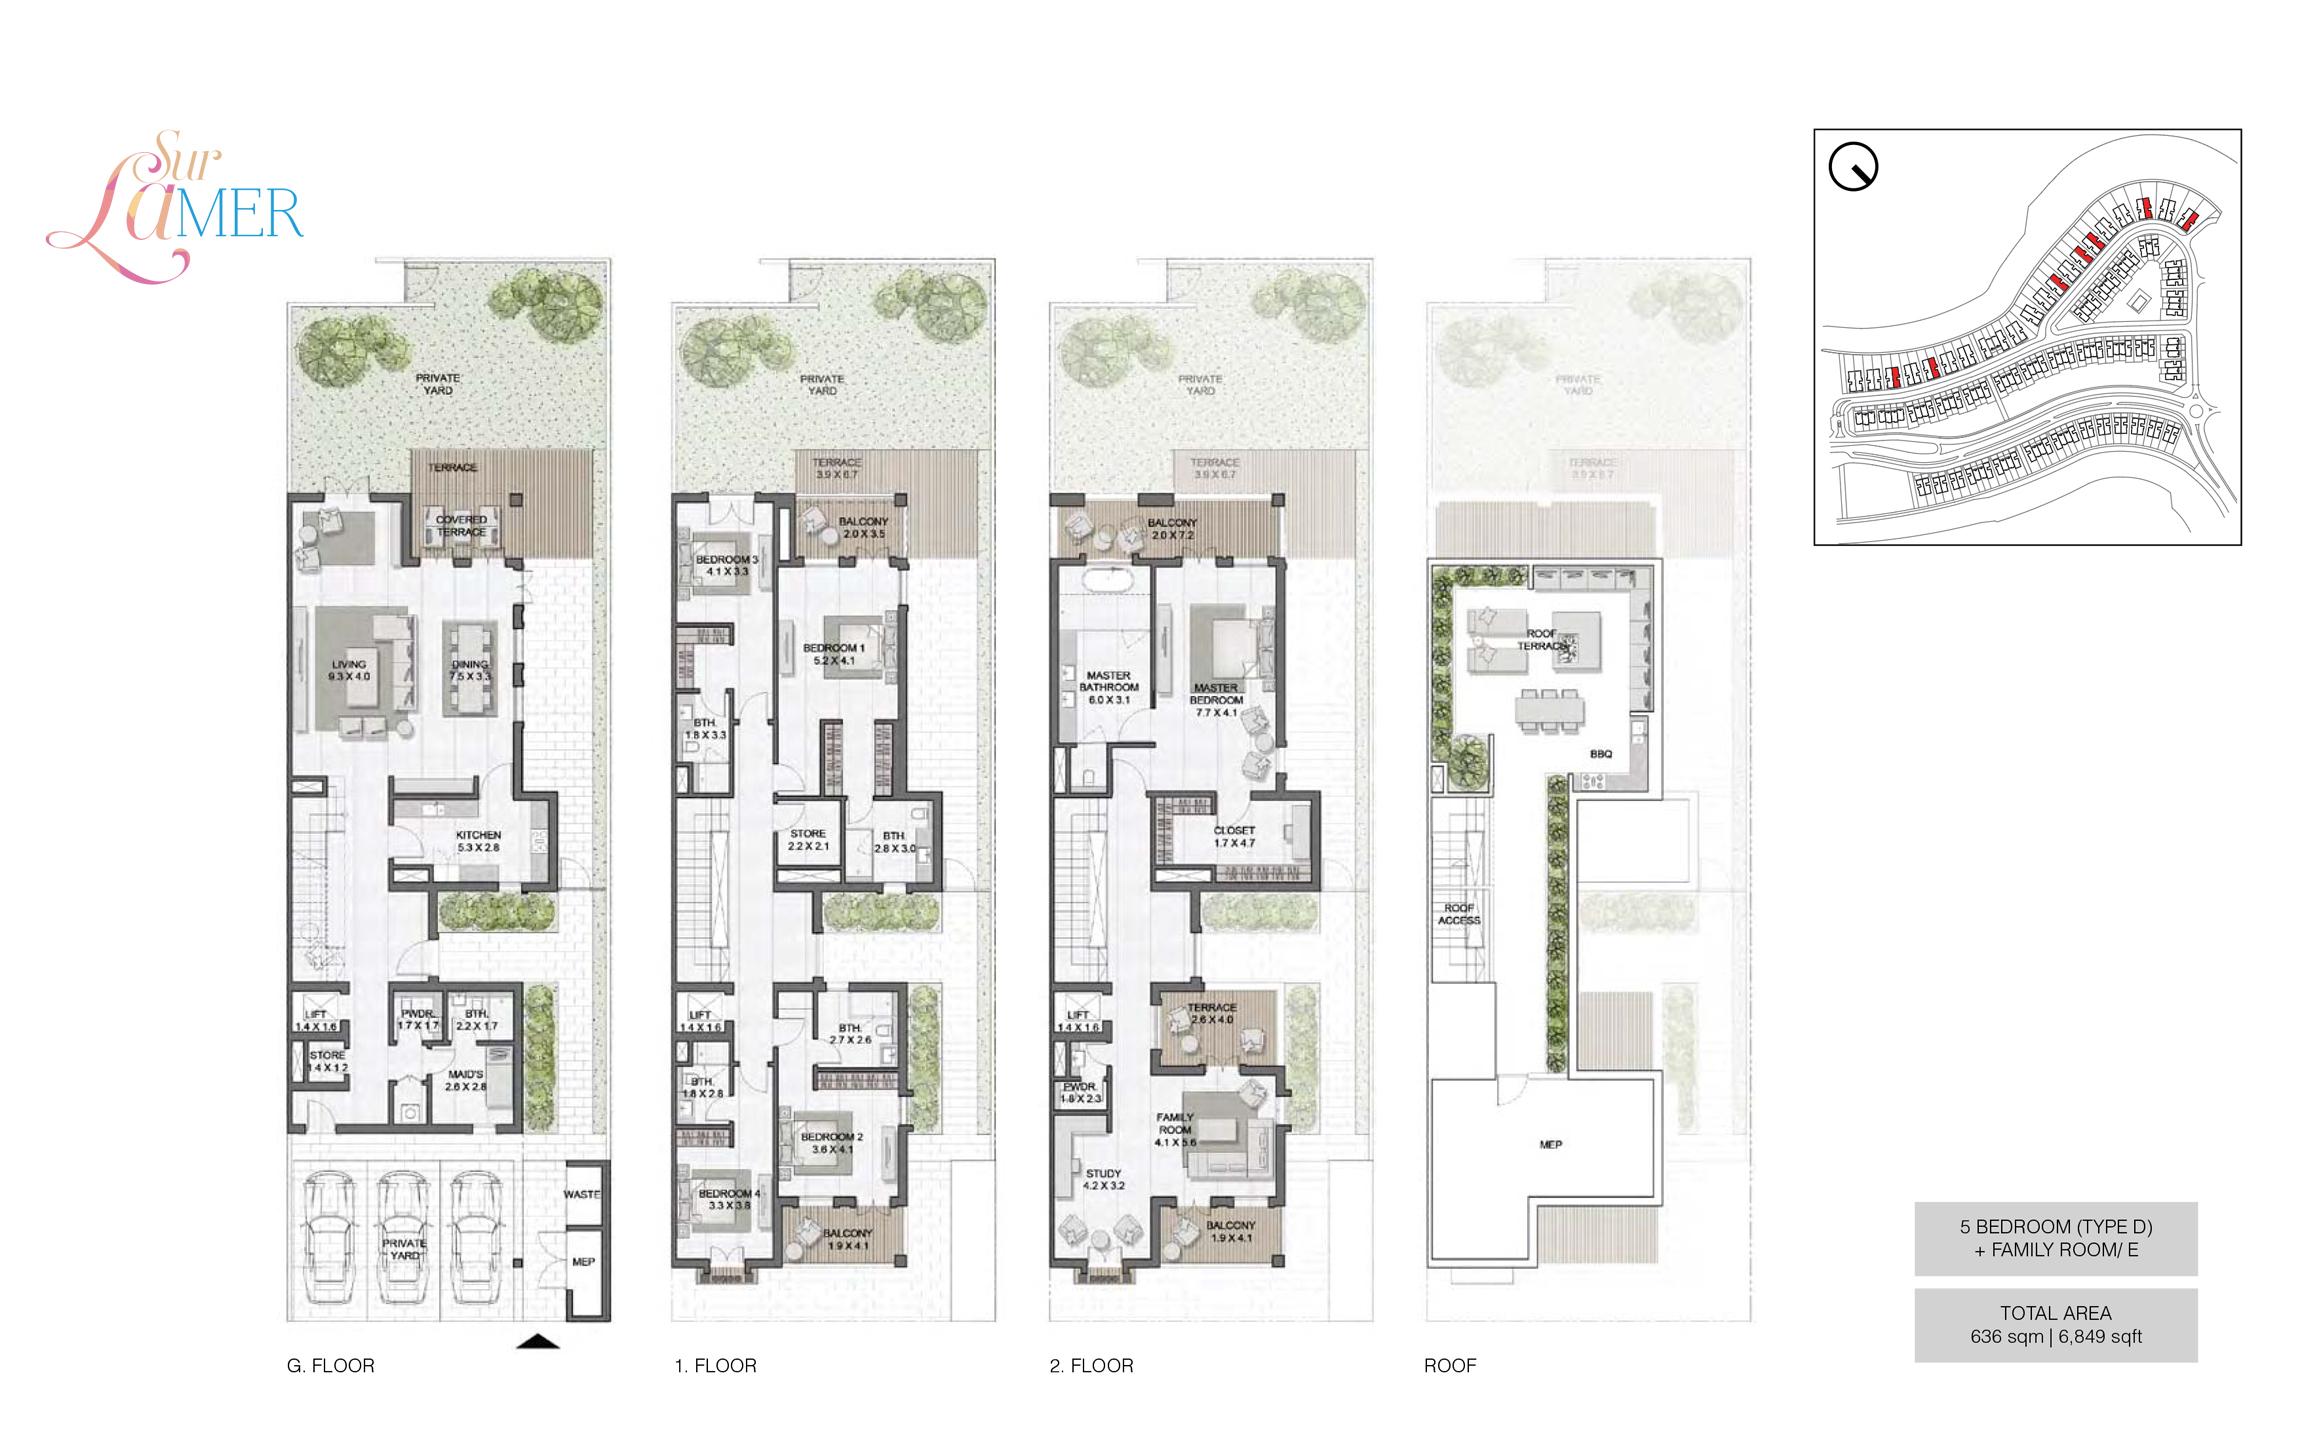 5 Bedroom Type D, Size 6849 sq.ft